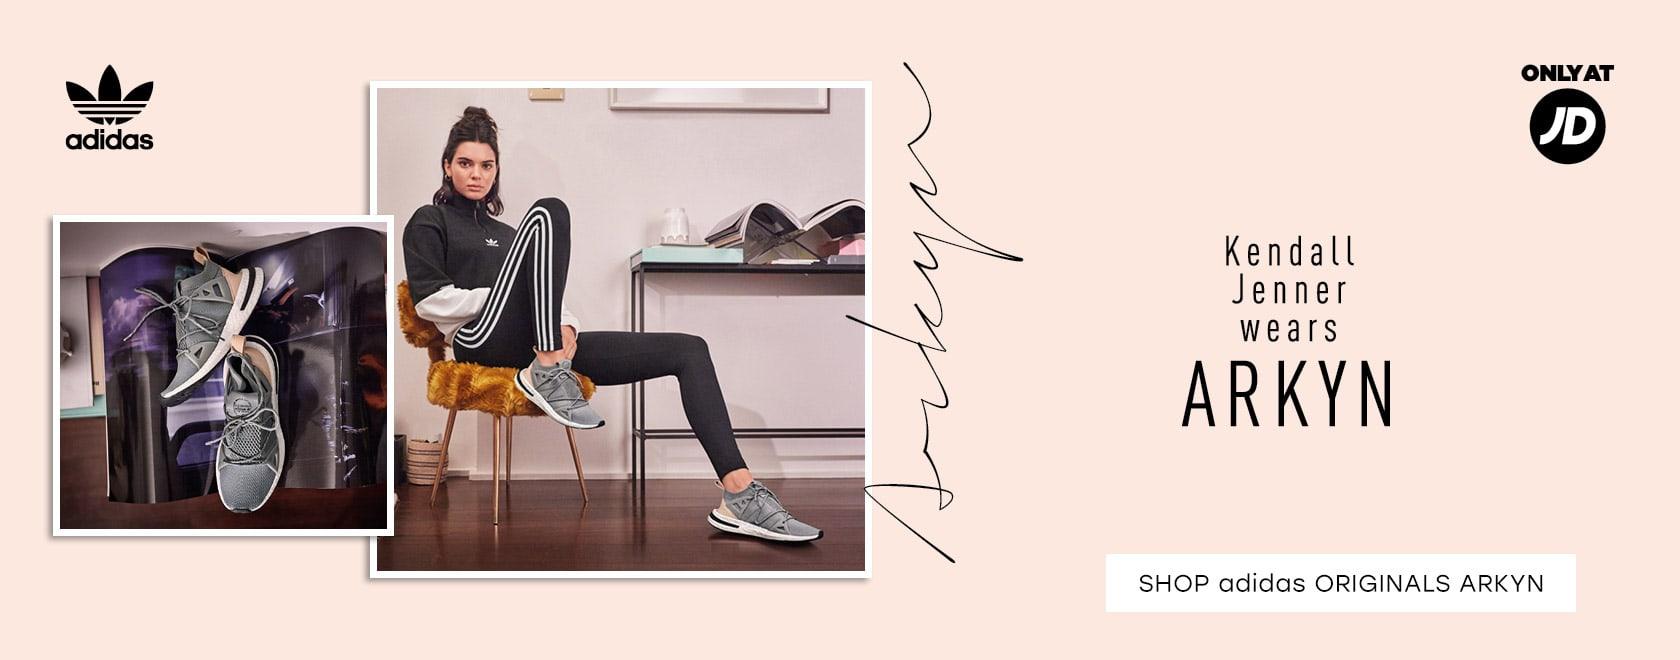 adidas Originals Arkyn